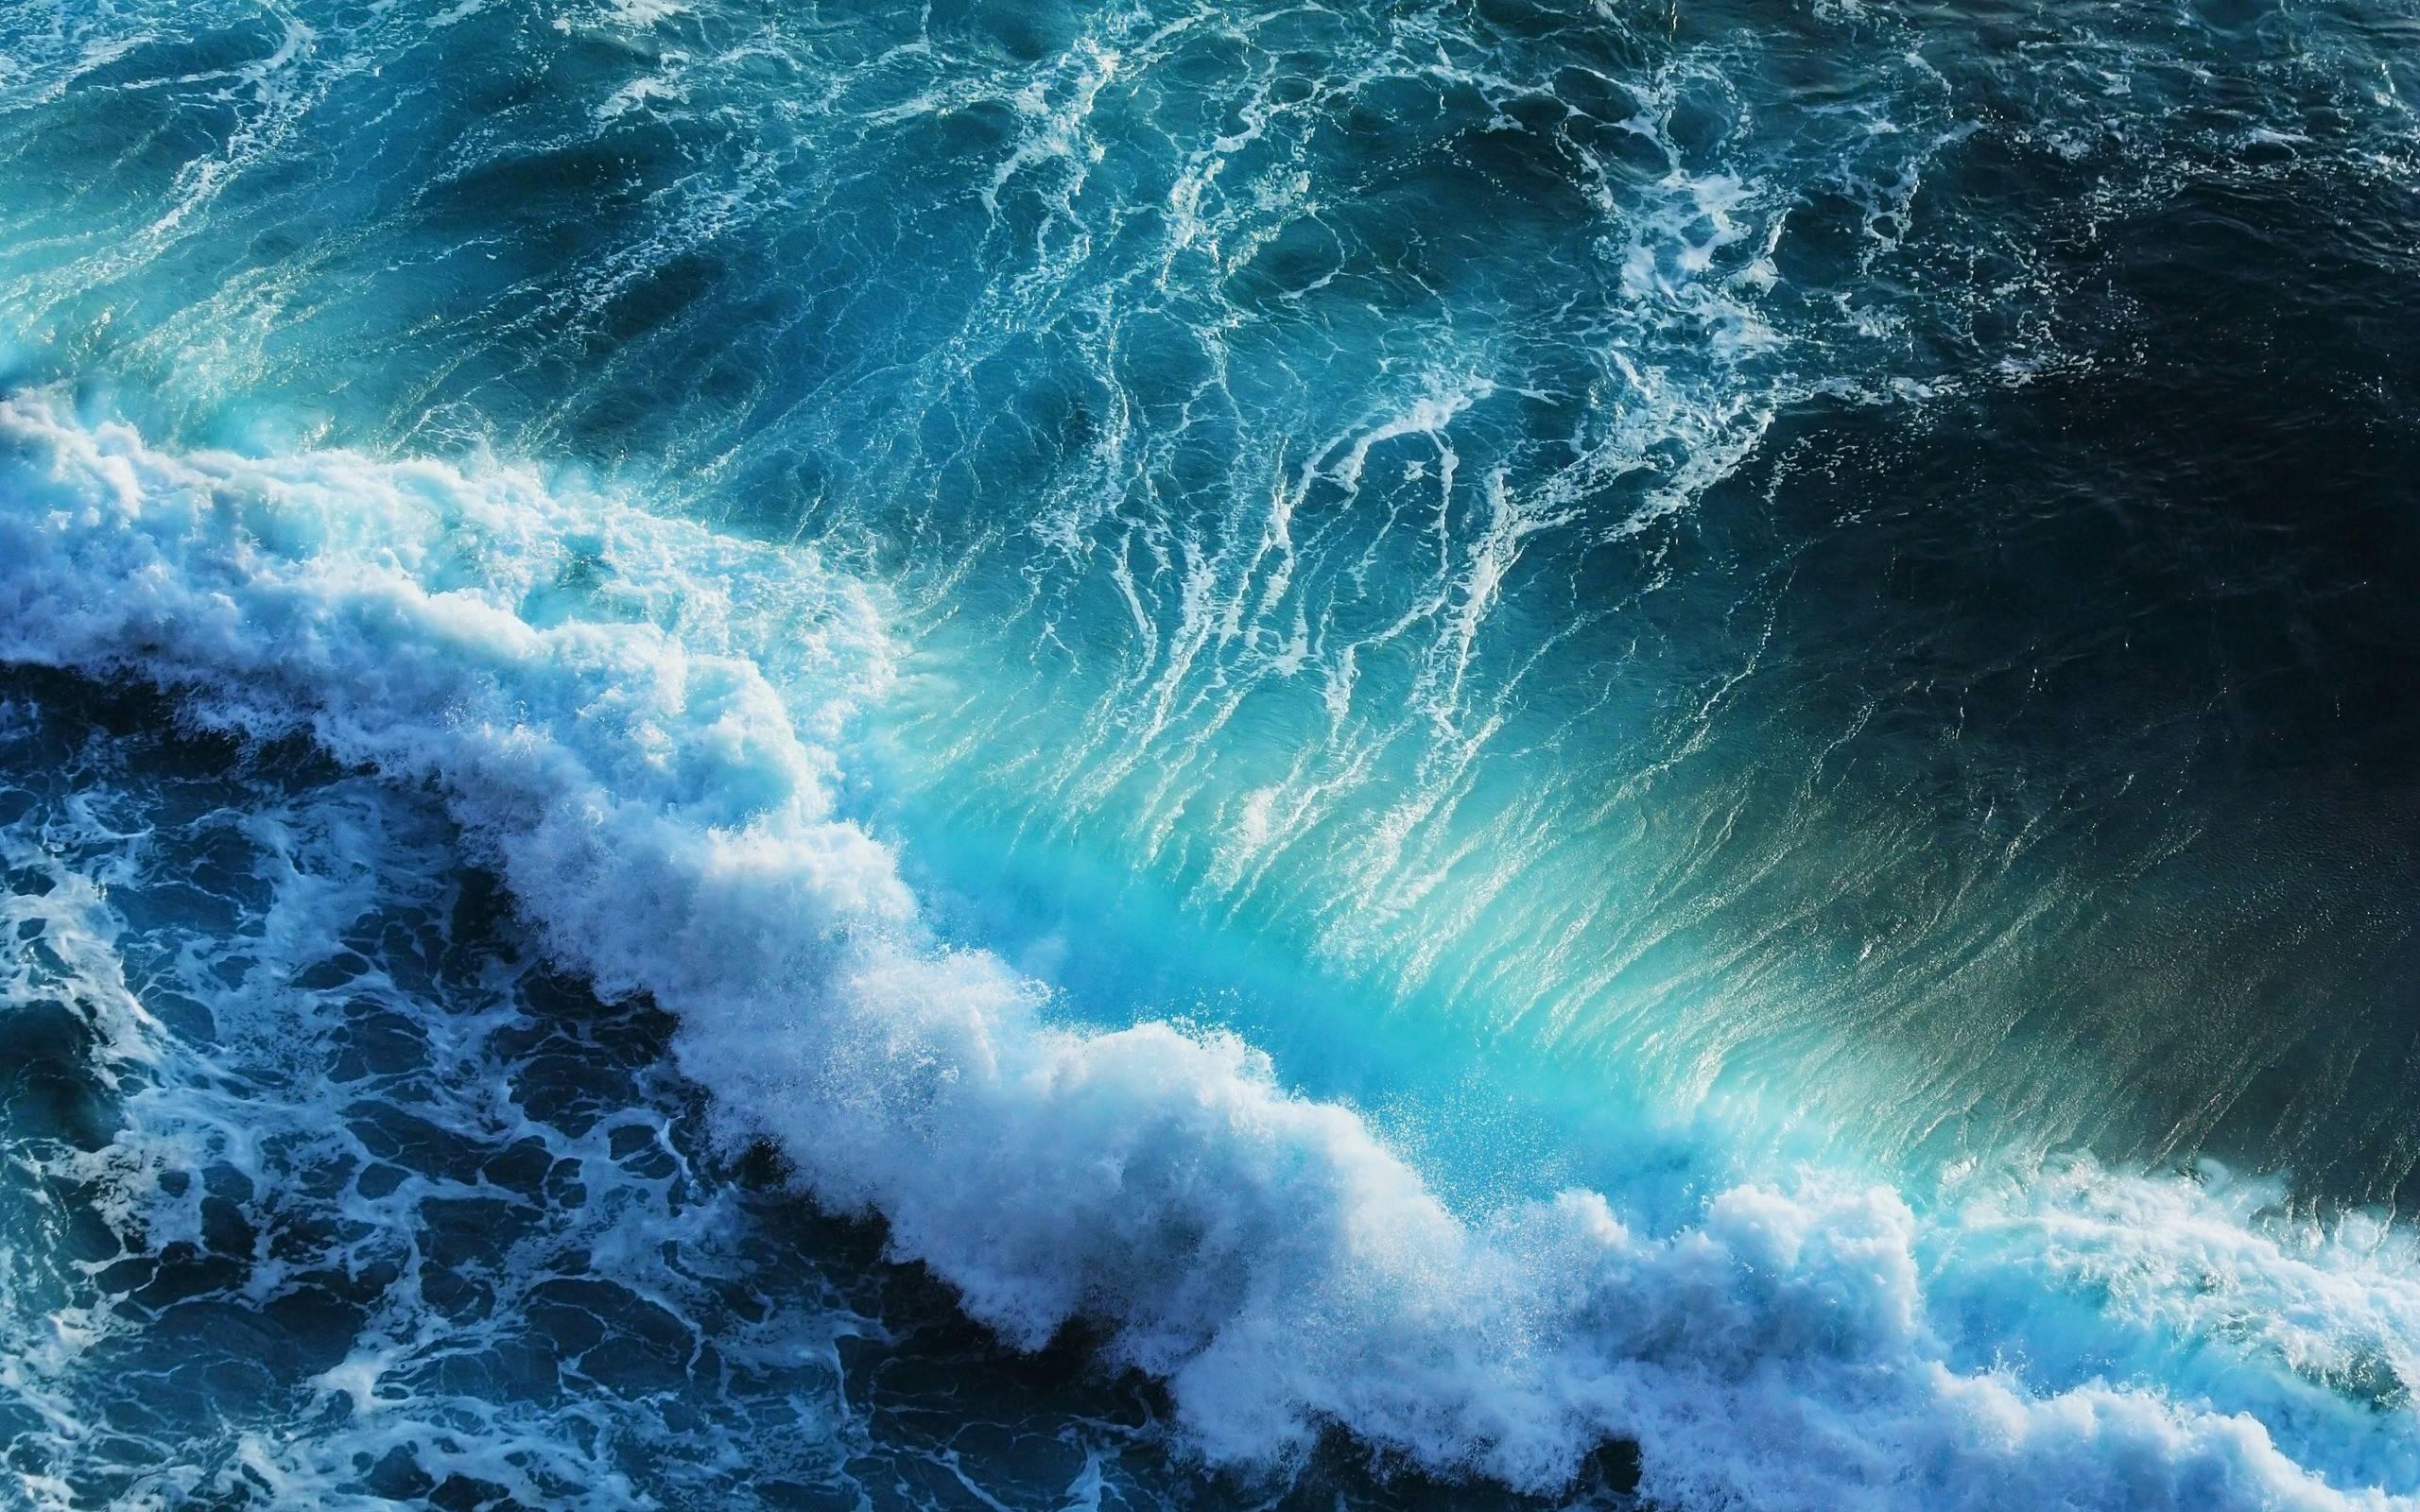 wallpaper of sea photo